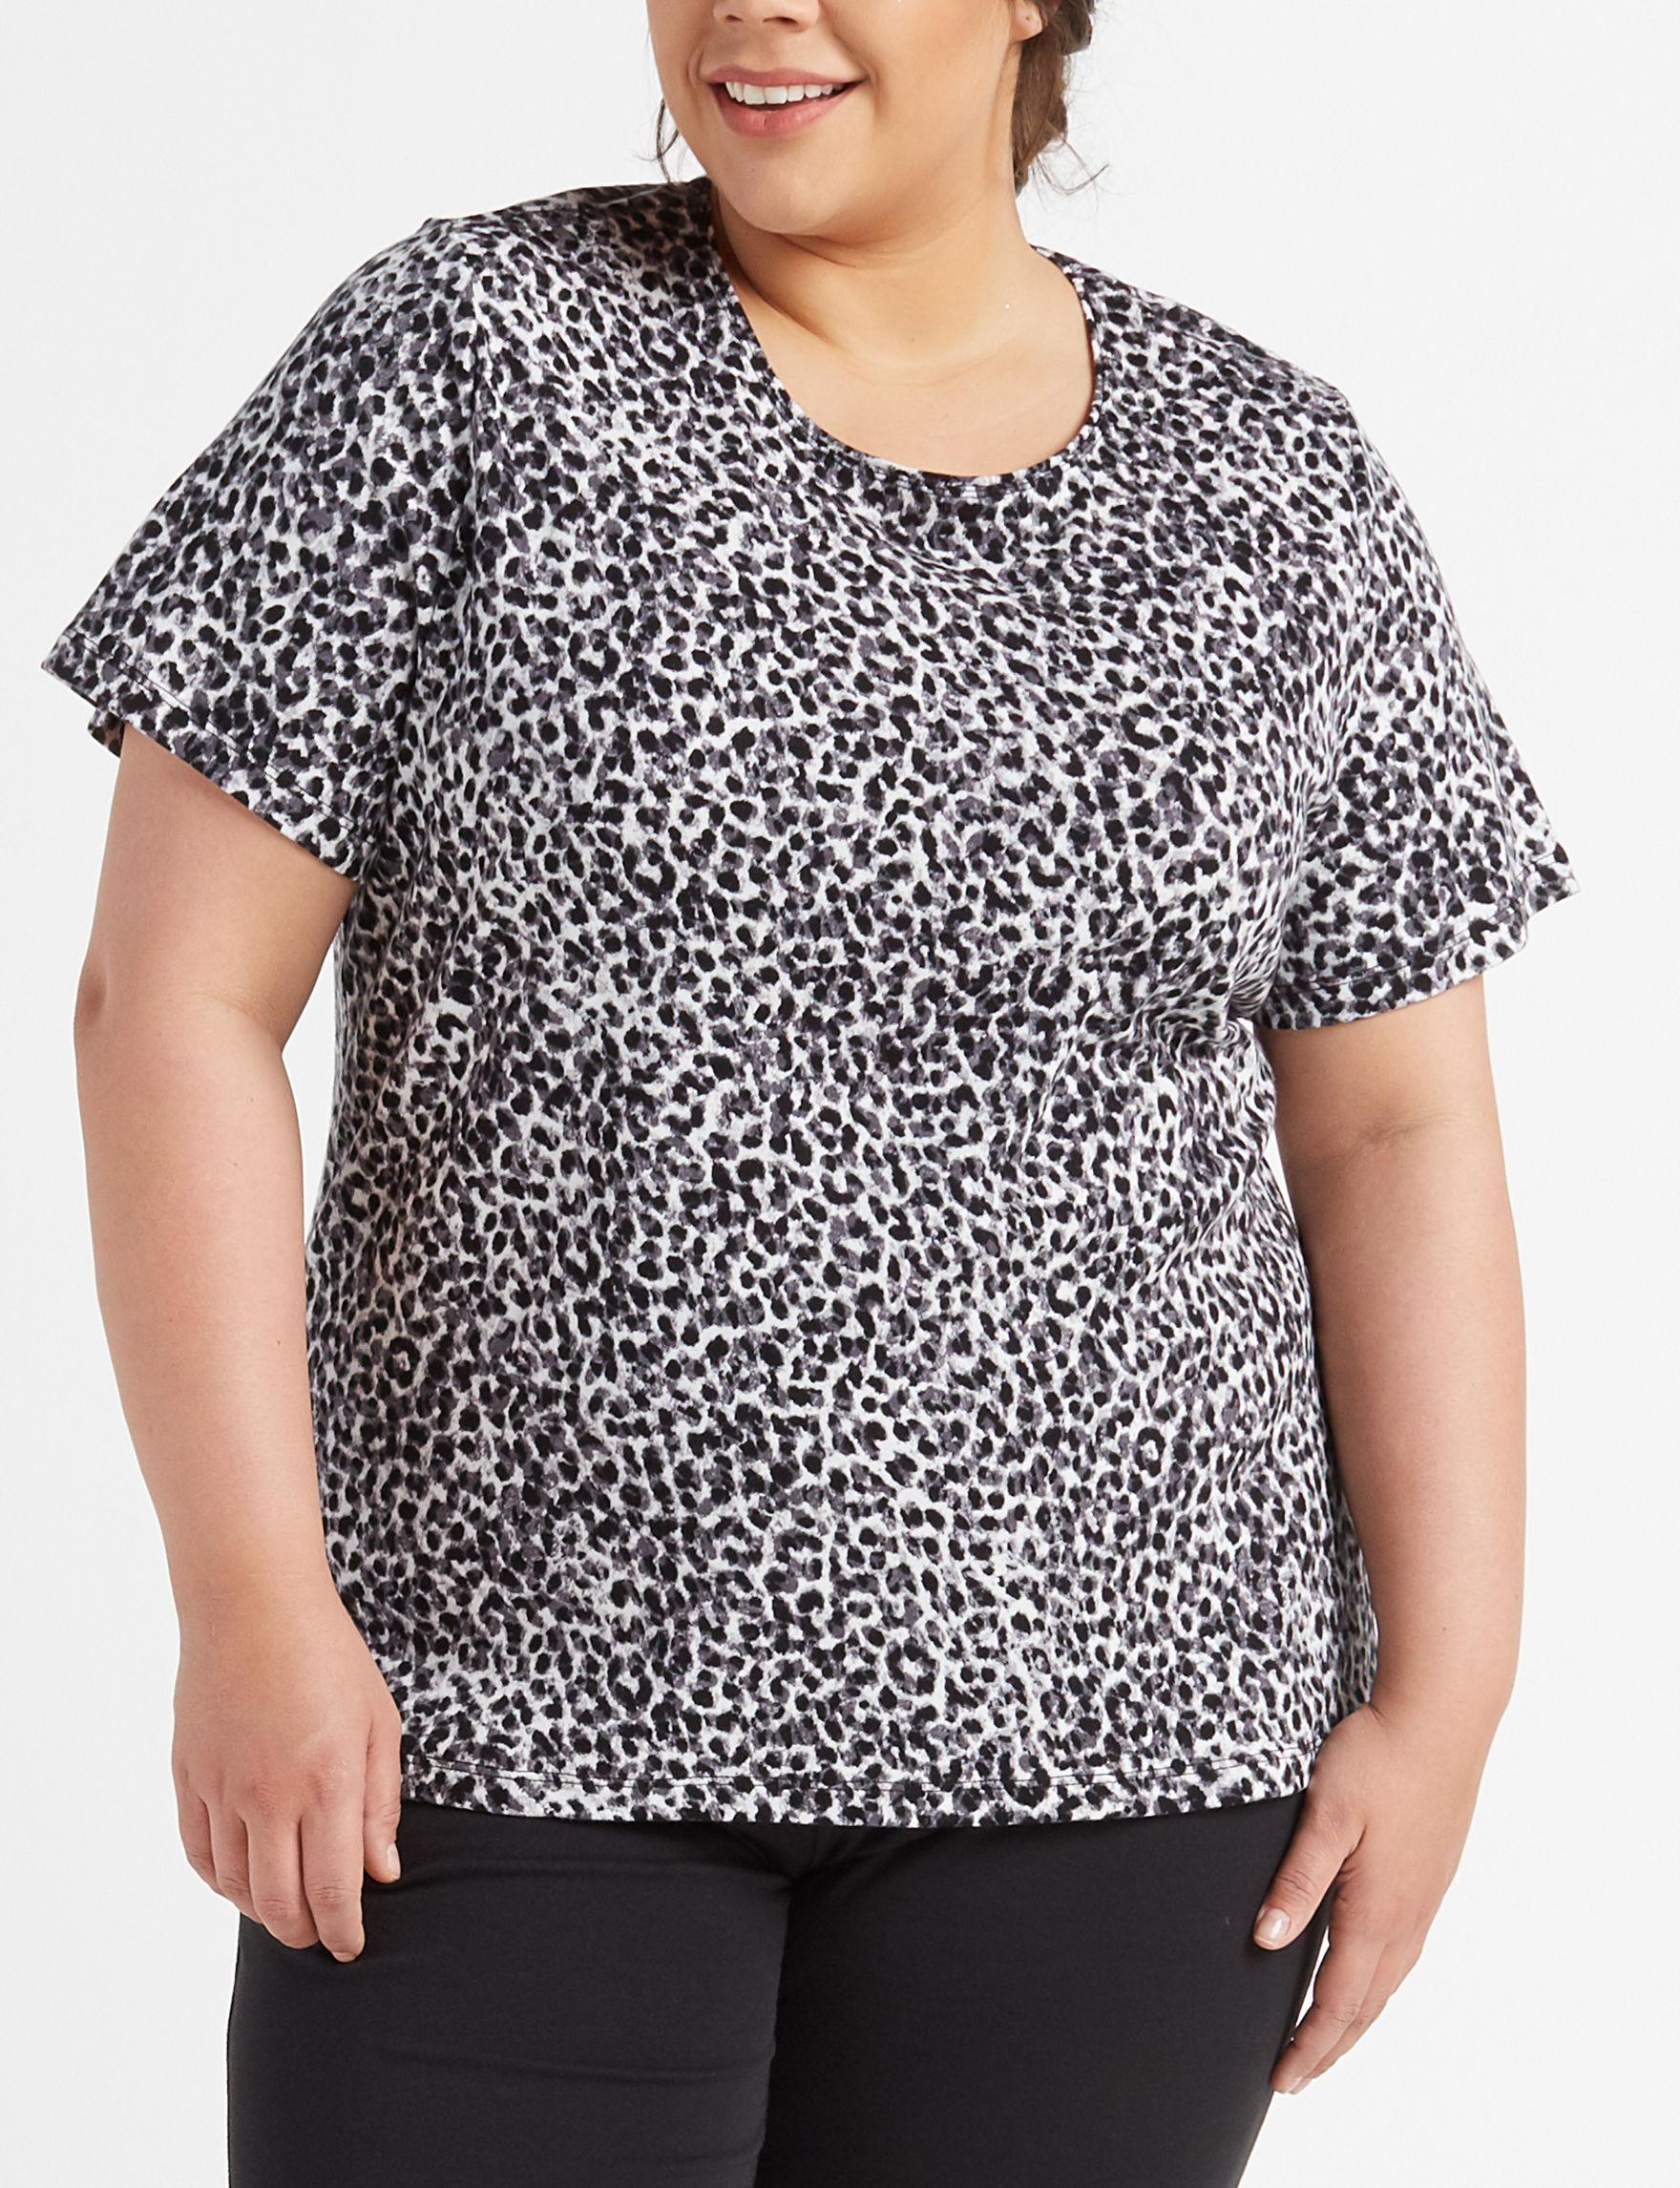 Rebecca Malone White / Black Shirts & Blouses